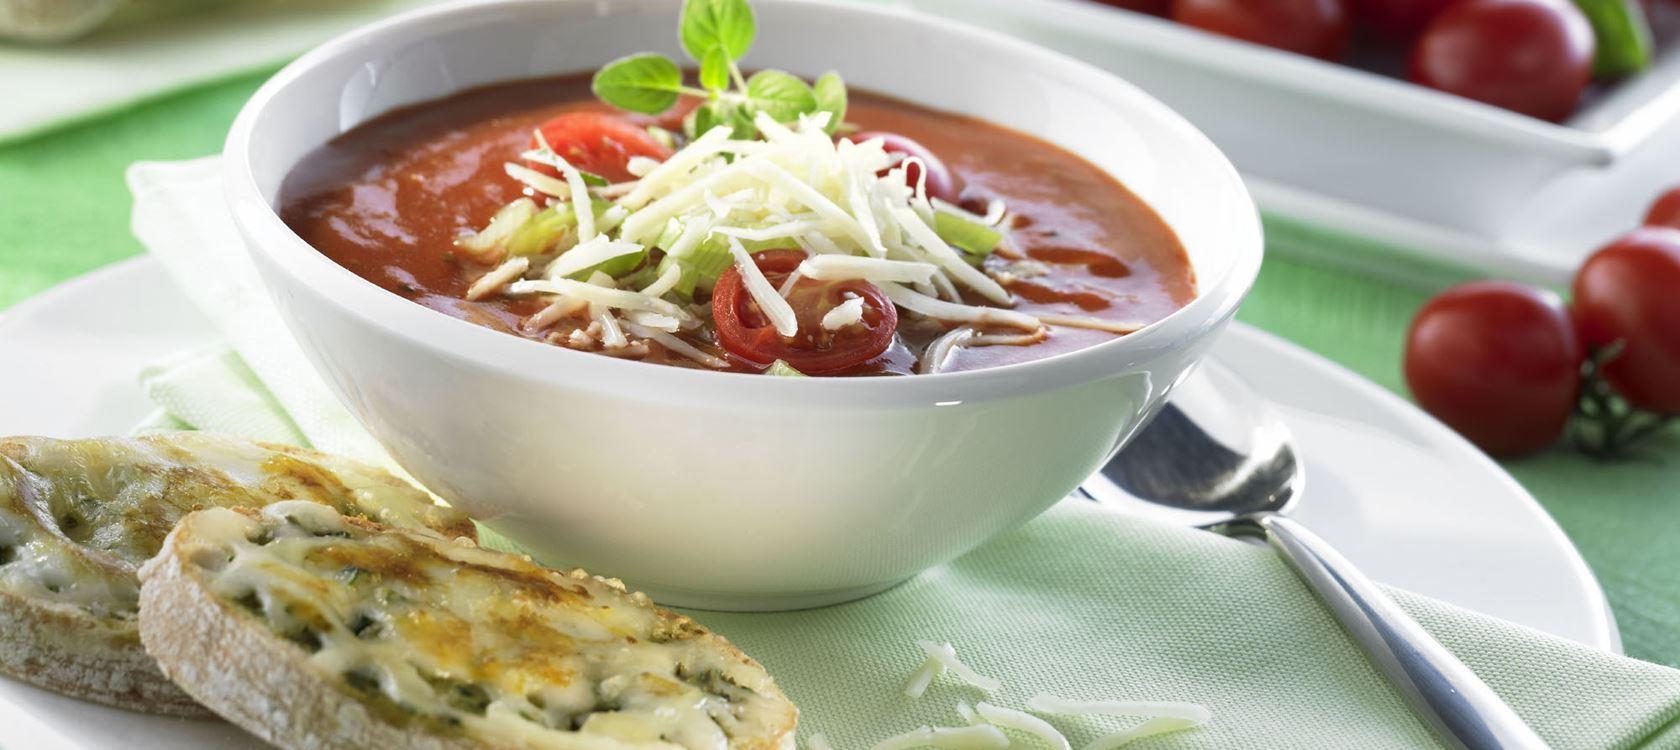 Tomato Soup with Pesto Cheese Bread